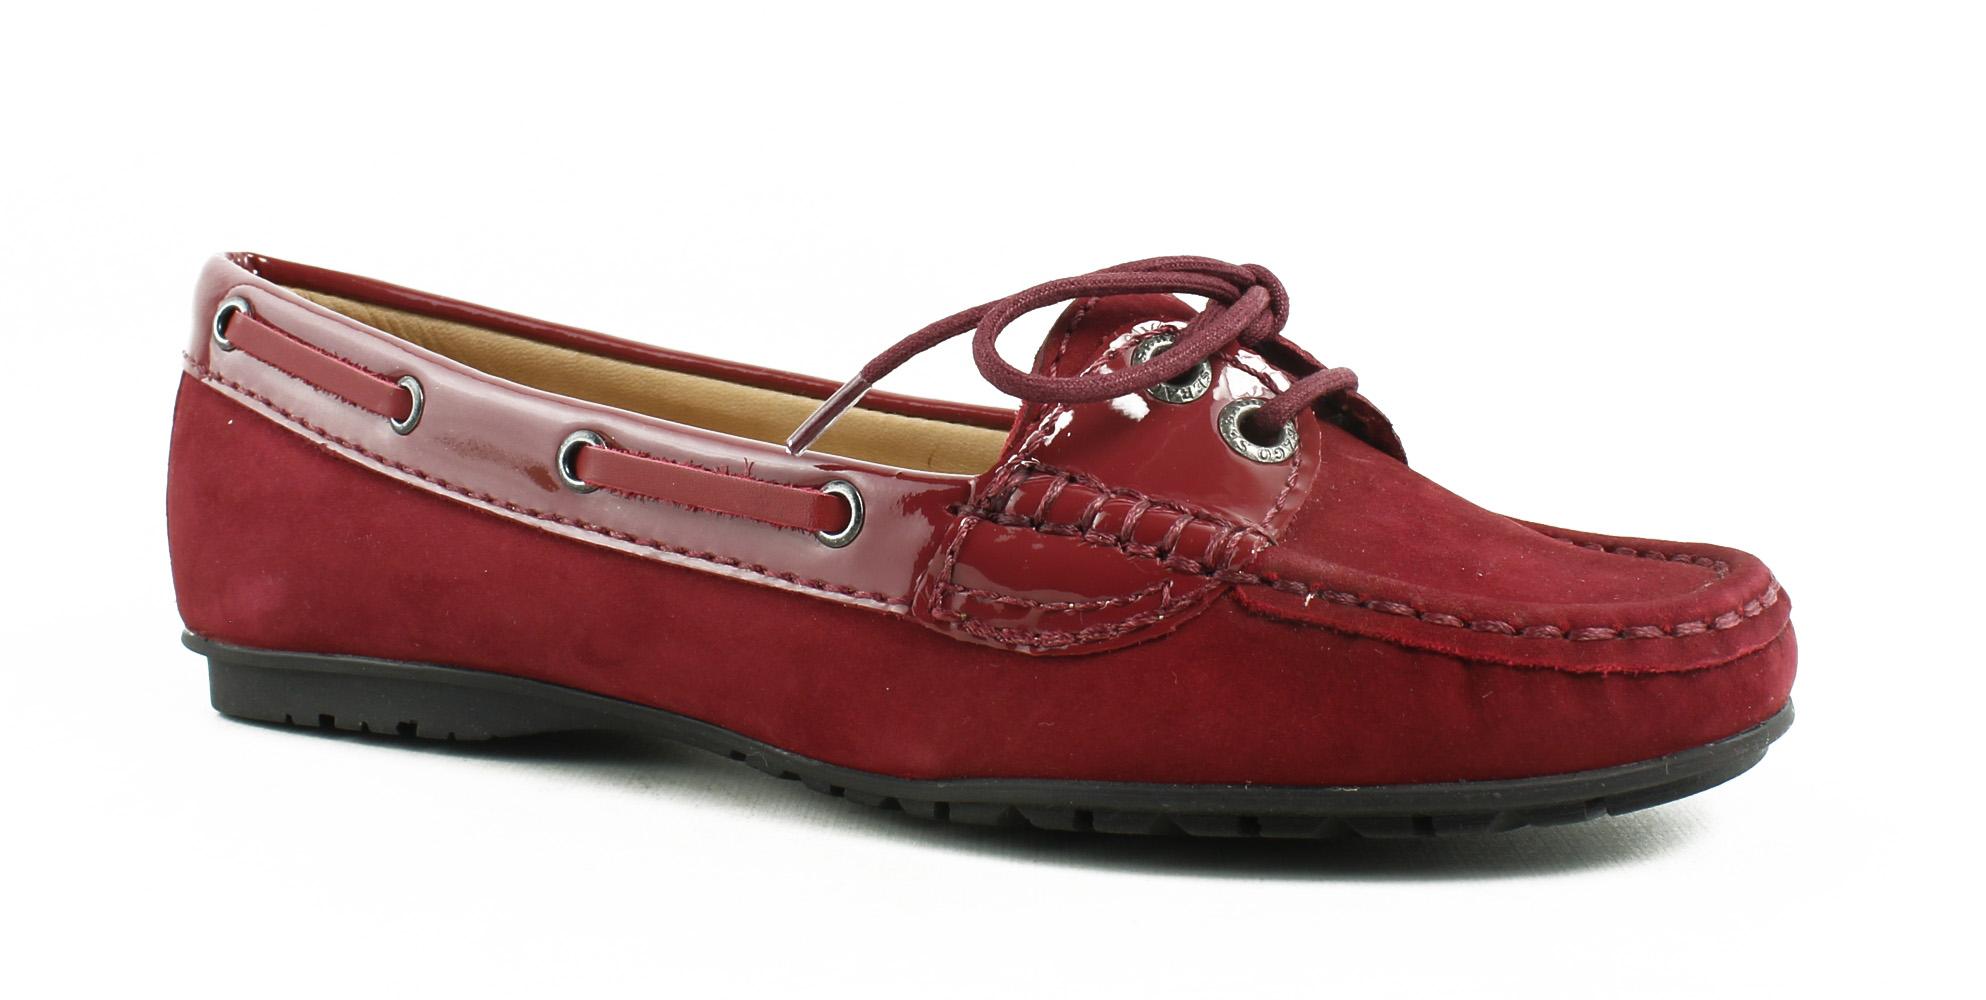 New Sebago Womens Meridantwoeye Red Boat Shoes Size 5 by Sebago